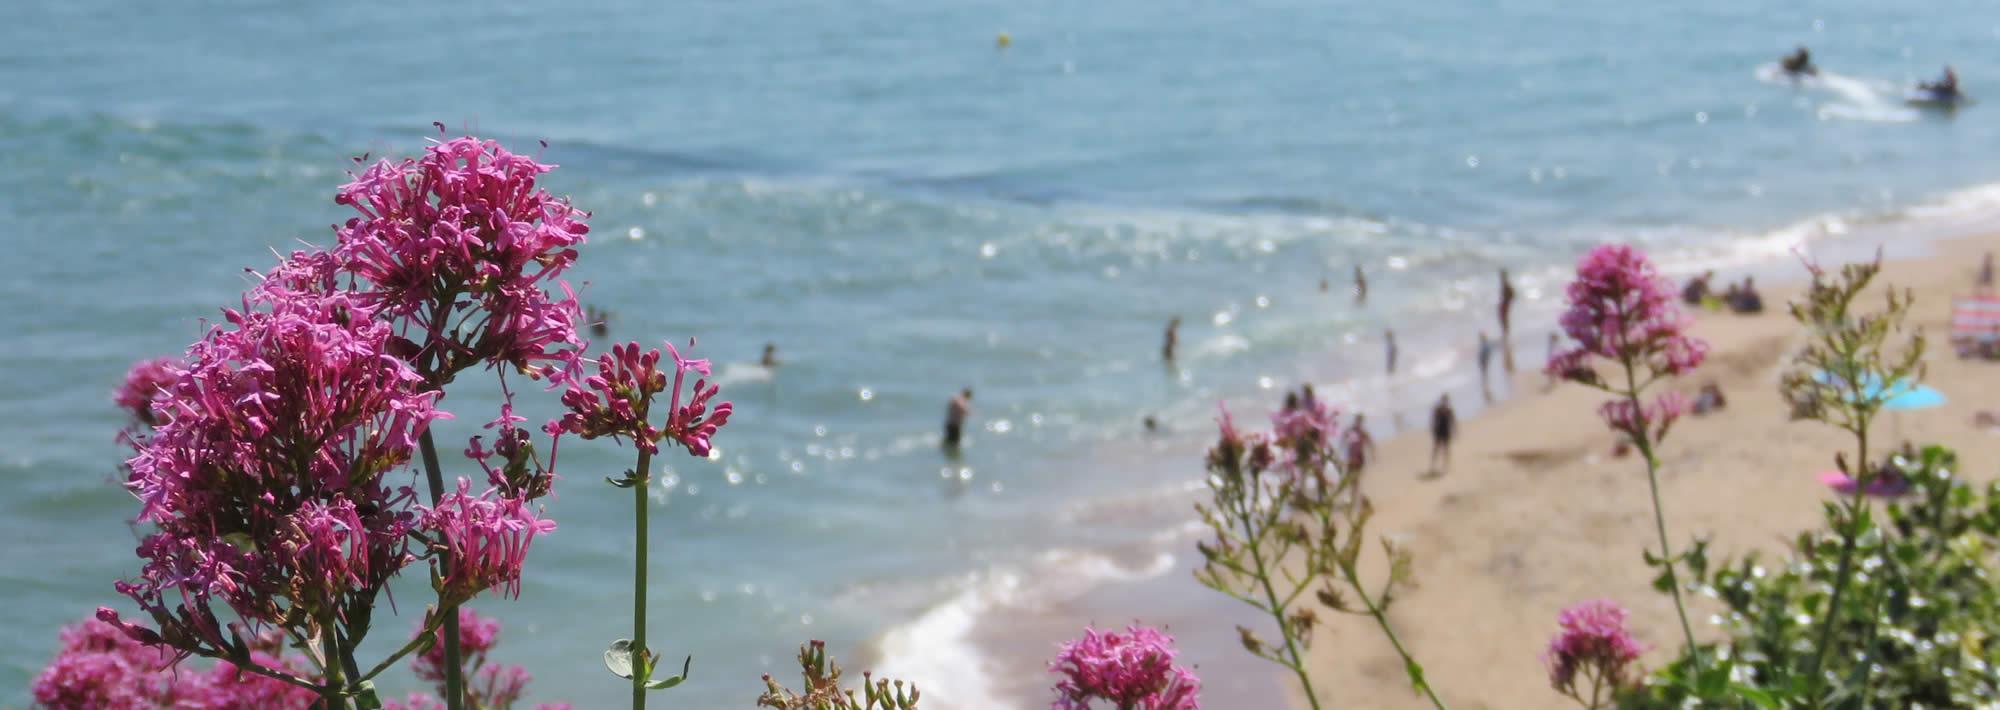 Flowers and sandy beach - Visit Ramsgate